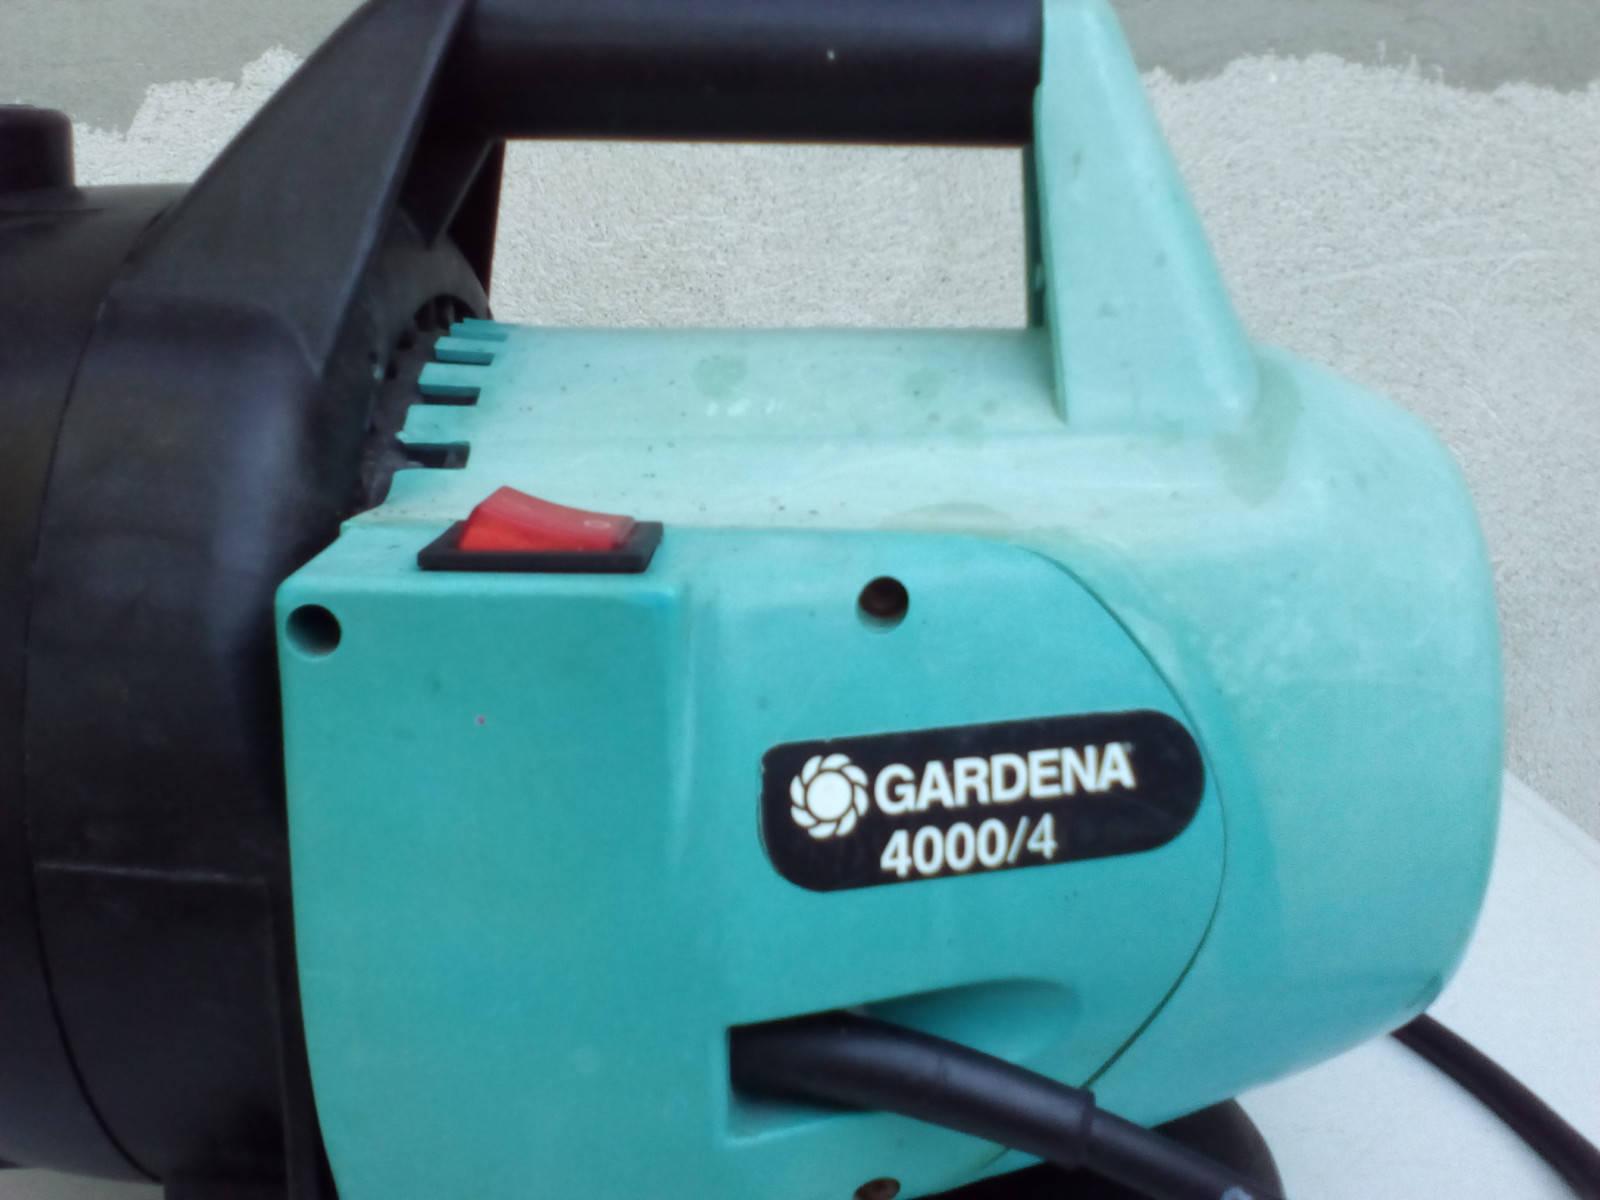 gardena 4000 4 h zi sz vatty viz el sz r aj nd kba zsibv s r. Black Bedroom Furniture Sets. Home Design Ideas